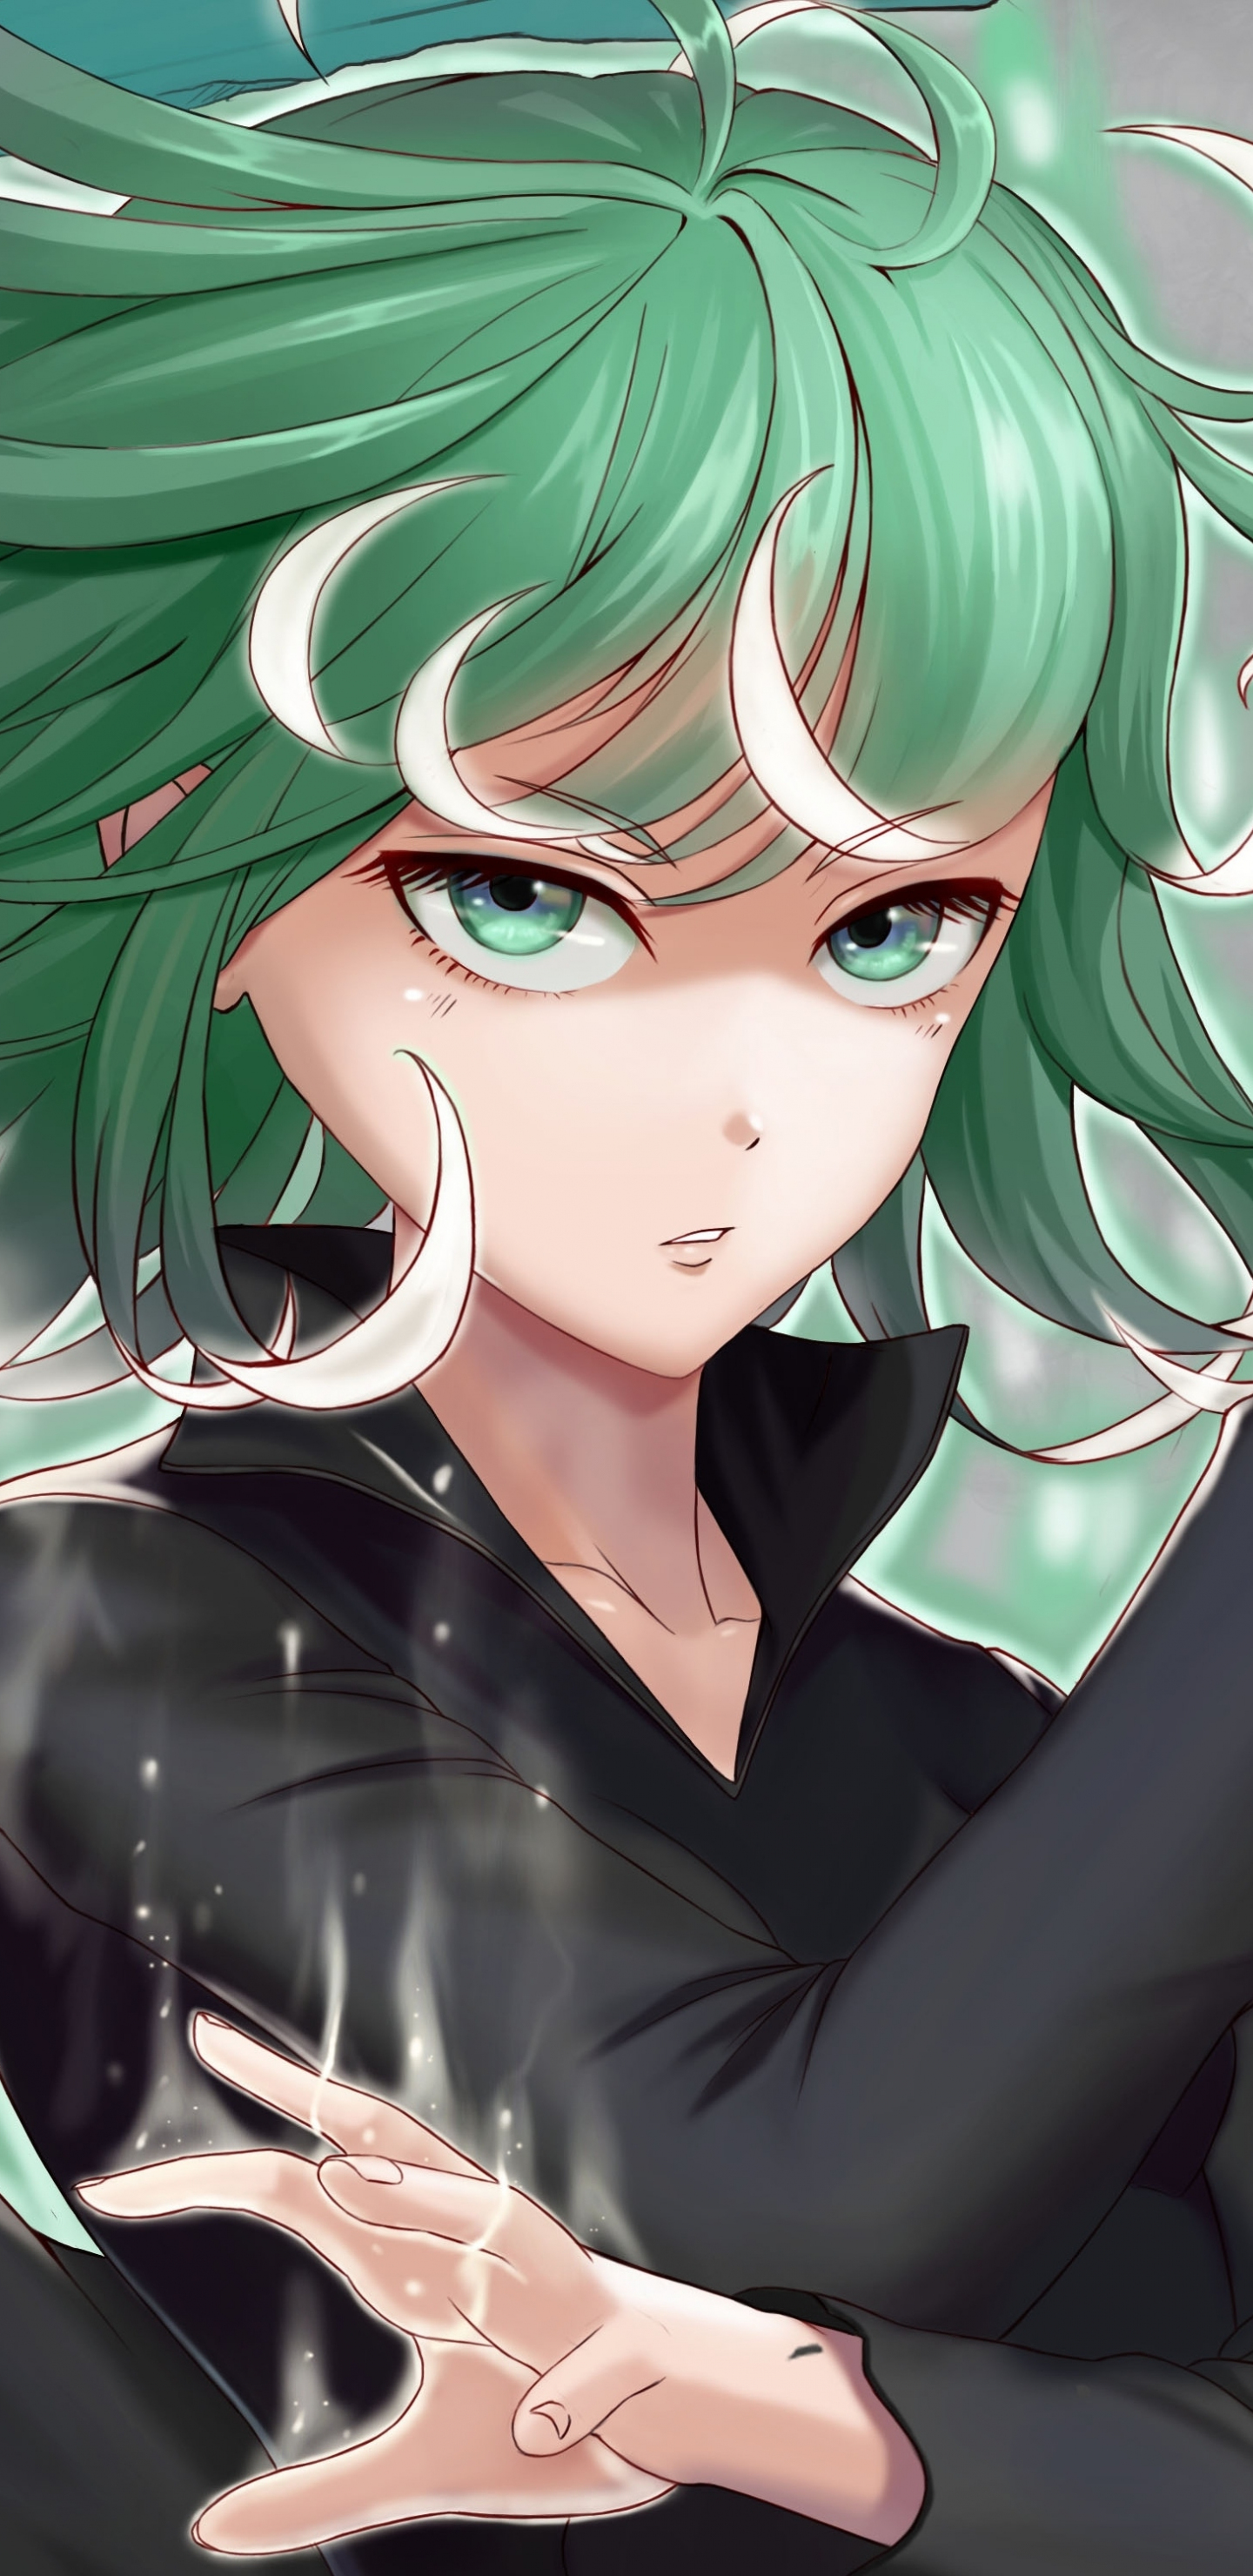 Download 1440x2960 Wallpaper Green Hair Tatsumaki One Punch Man